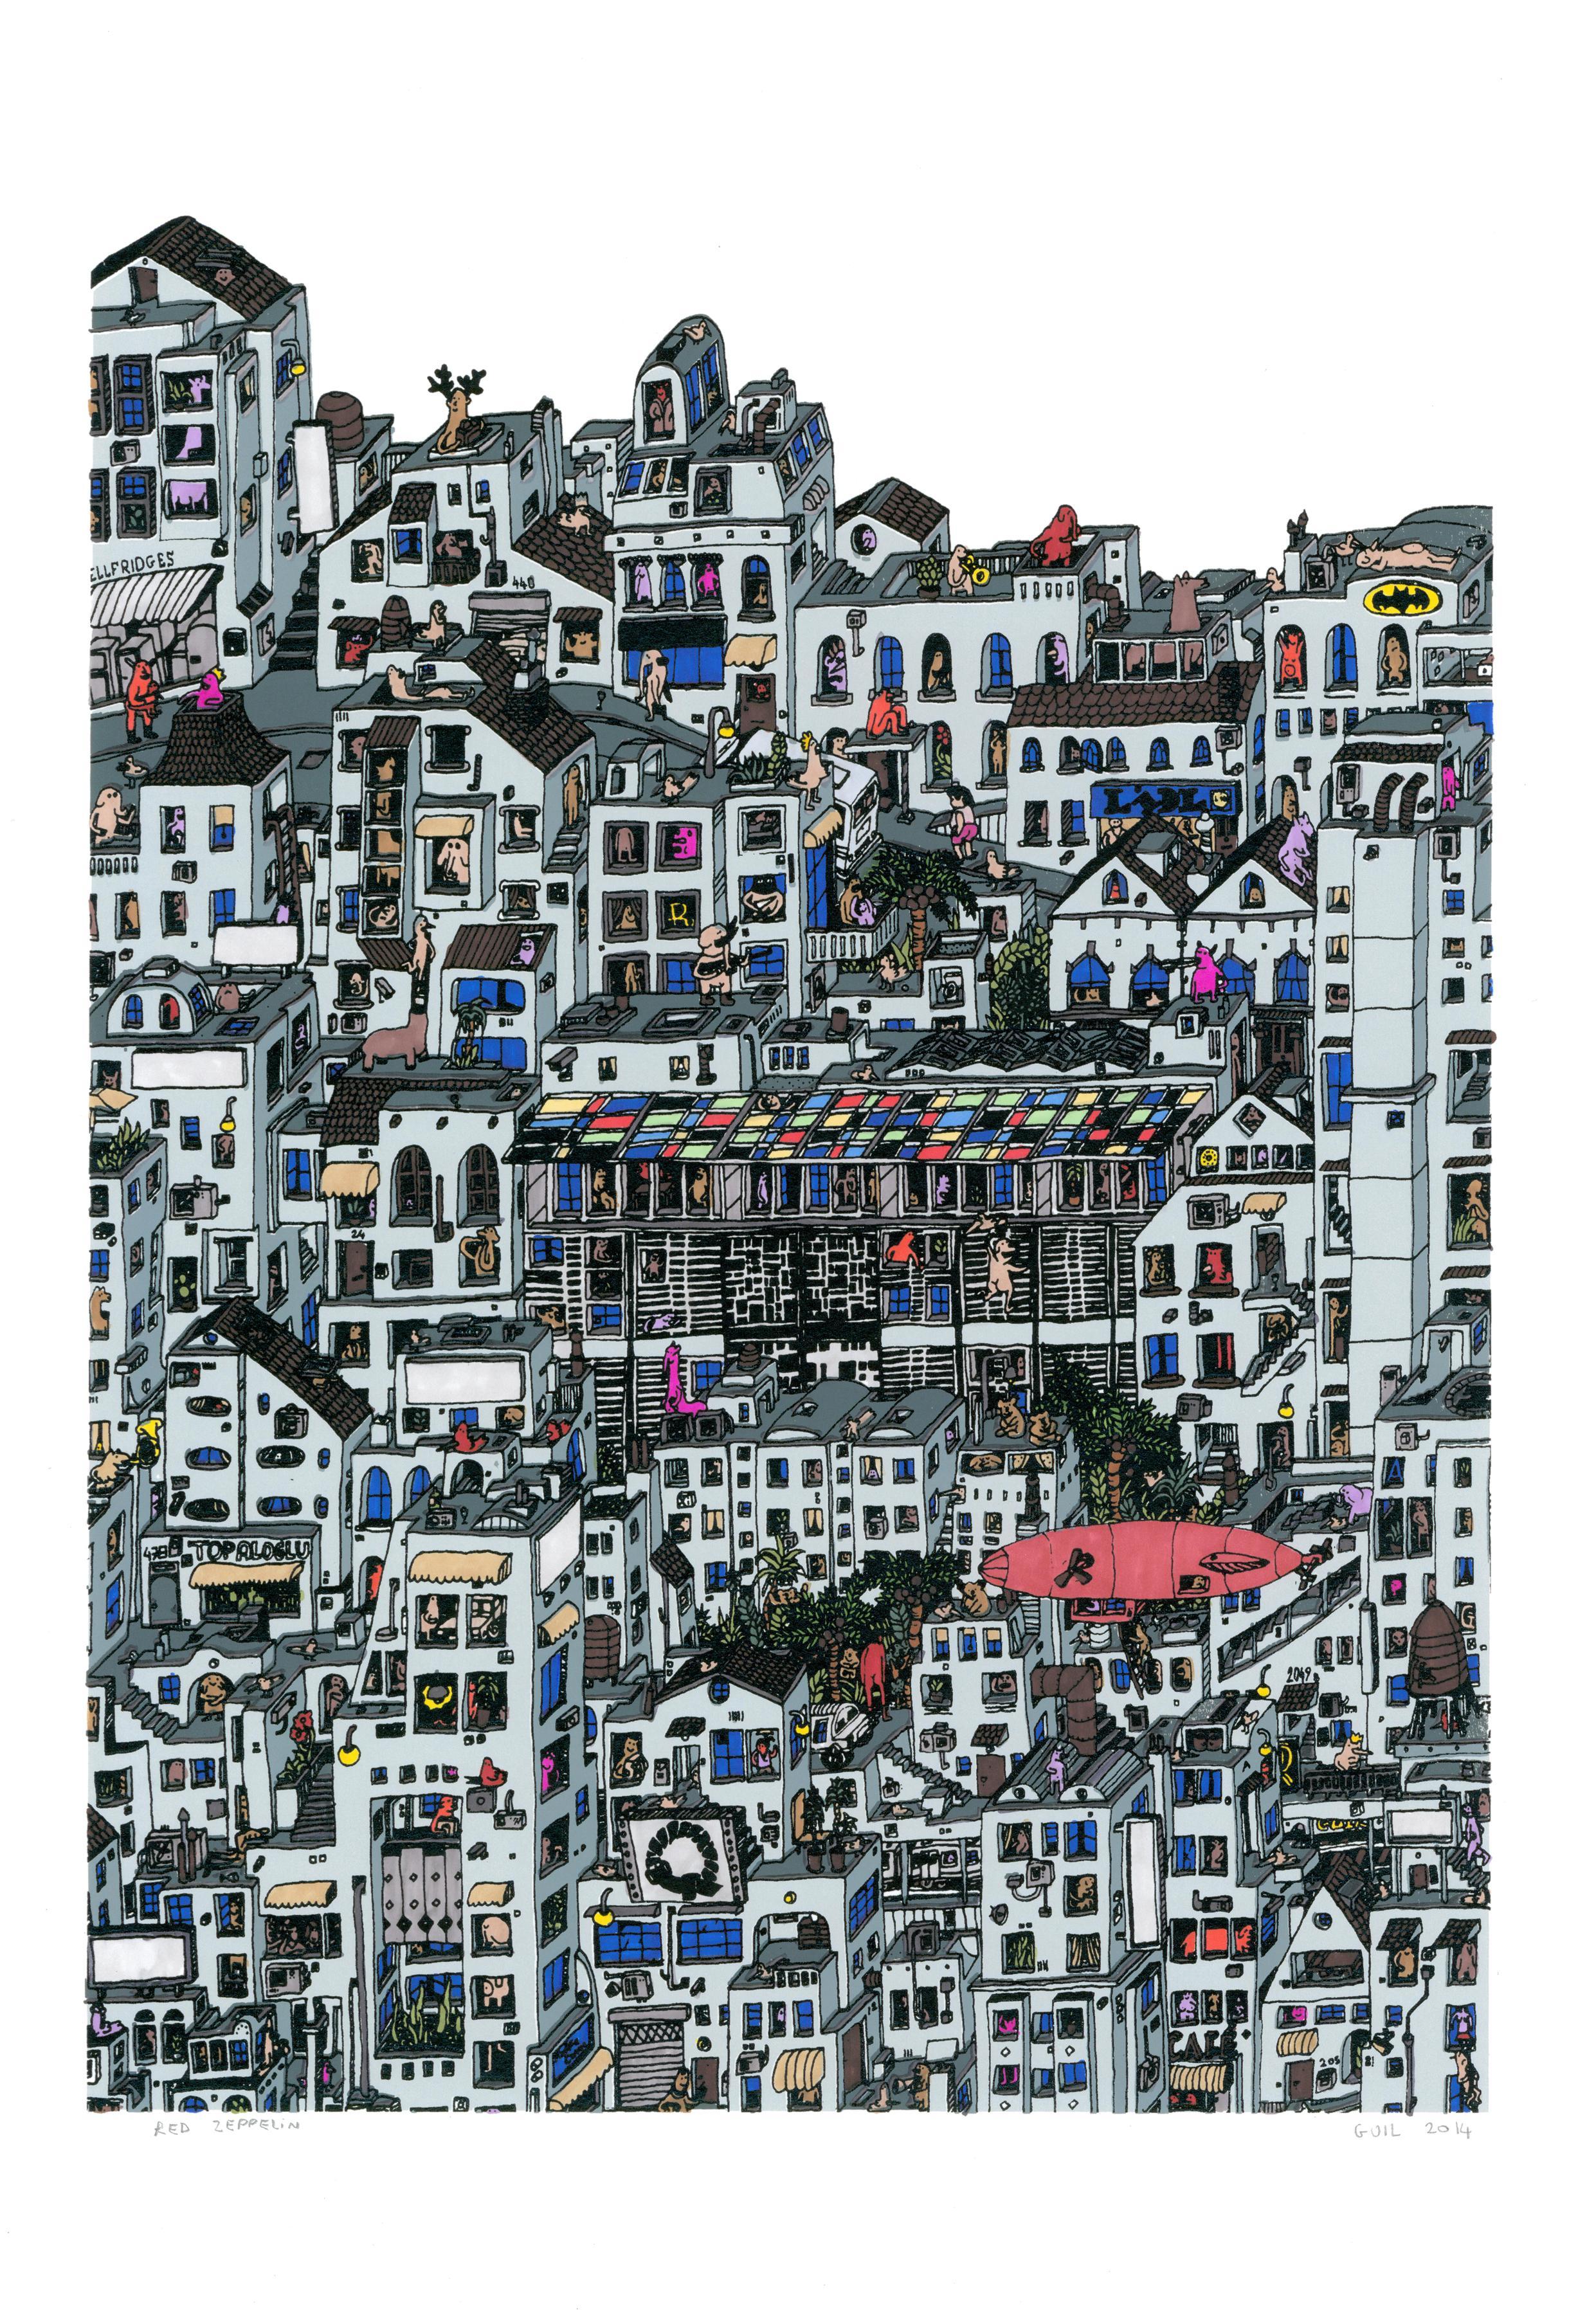 Red Zeppelin, fantastical jungle inspired cityscape by Guillaume Cornet framed